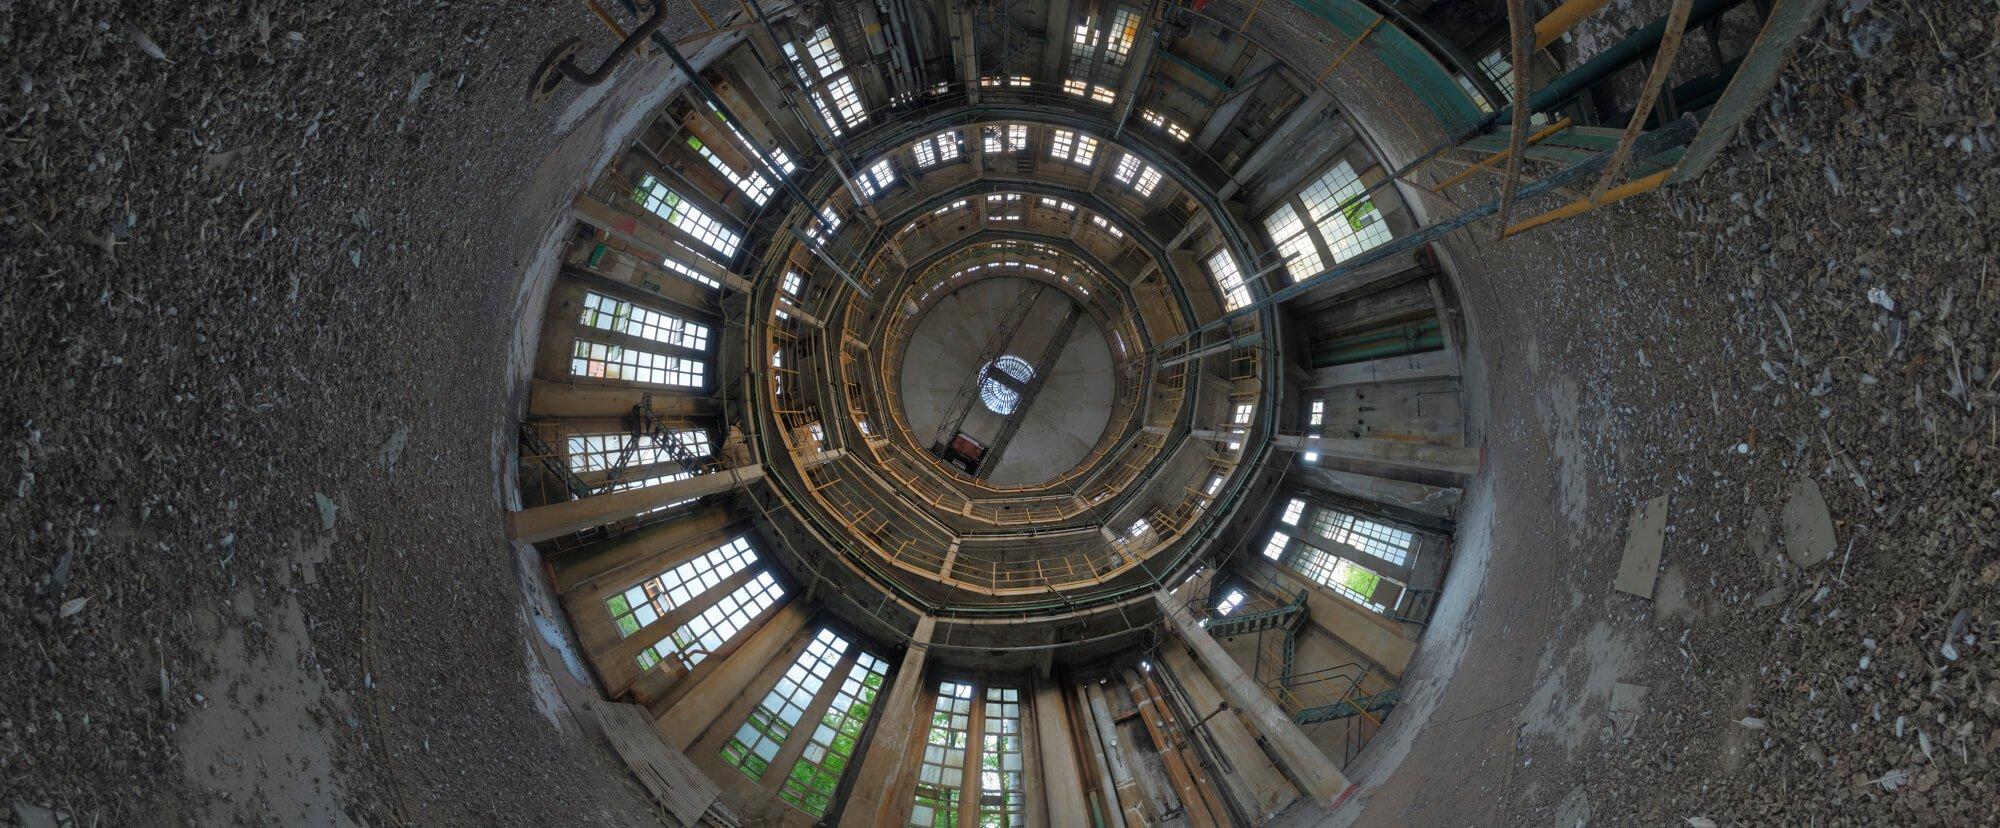 virtual tour urbex exploration power station